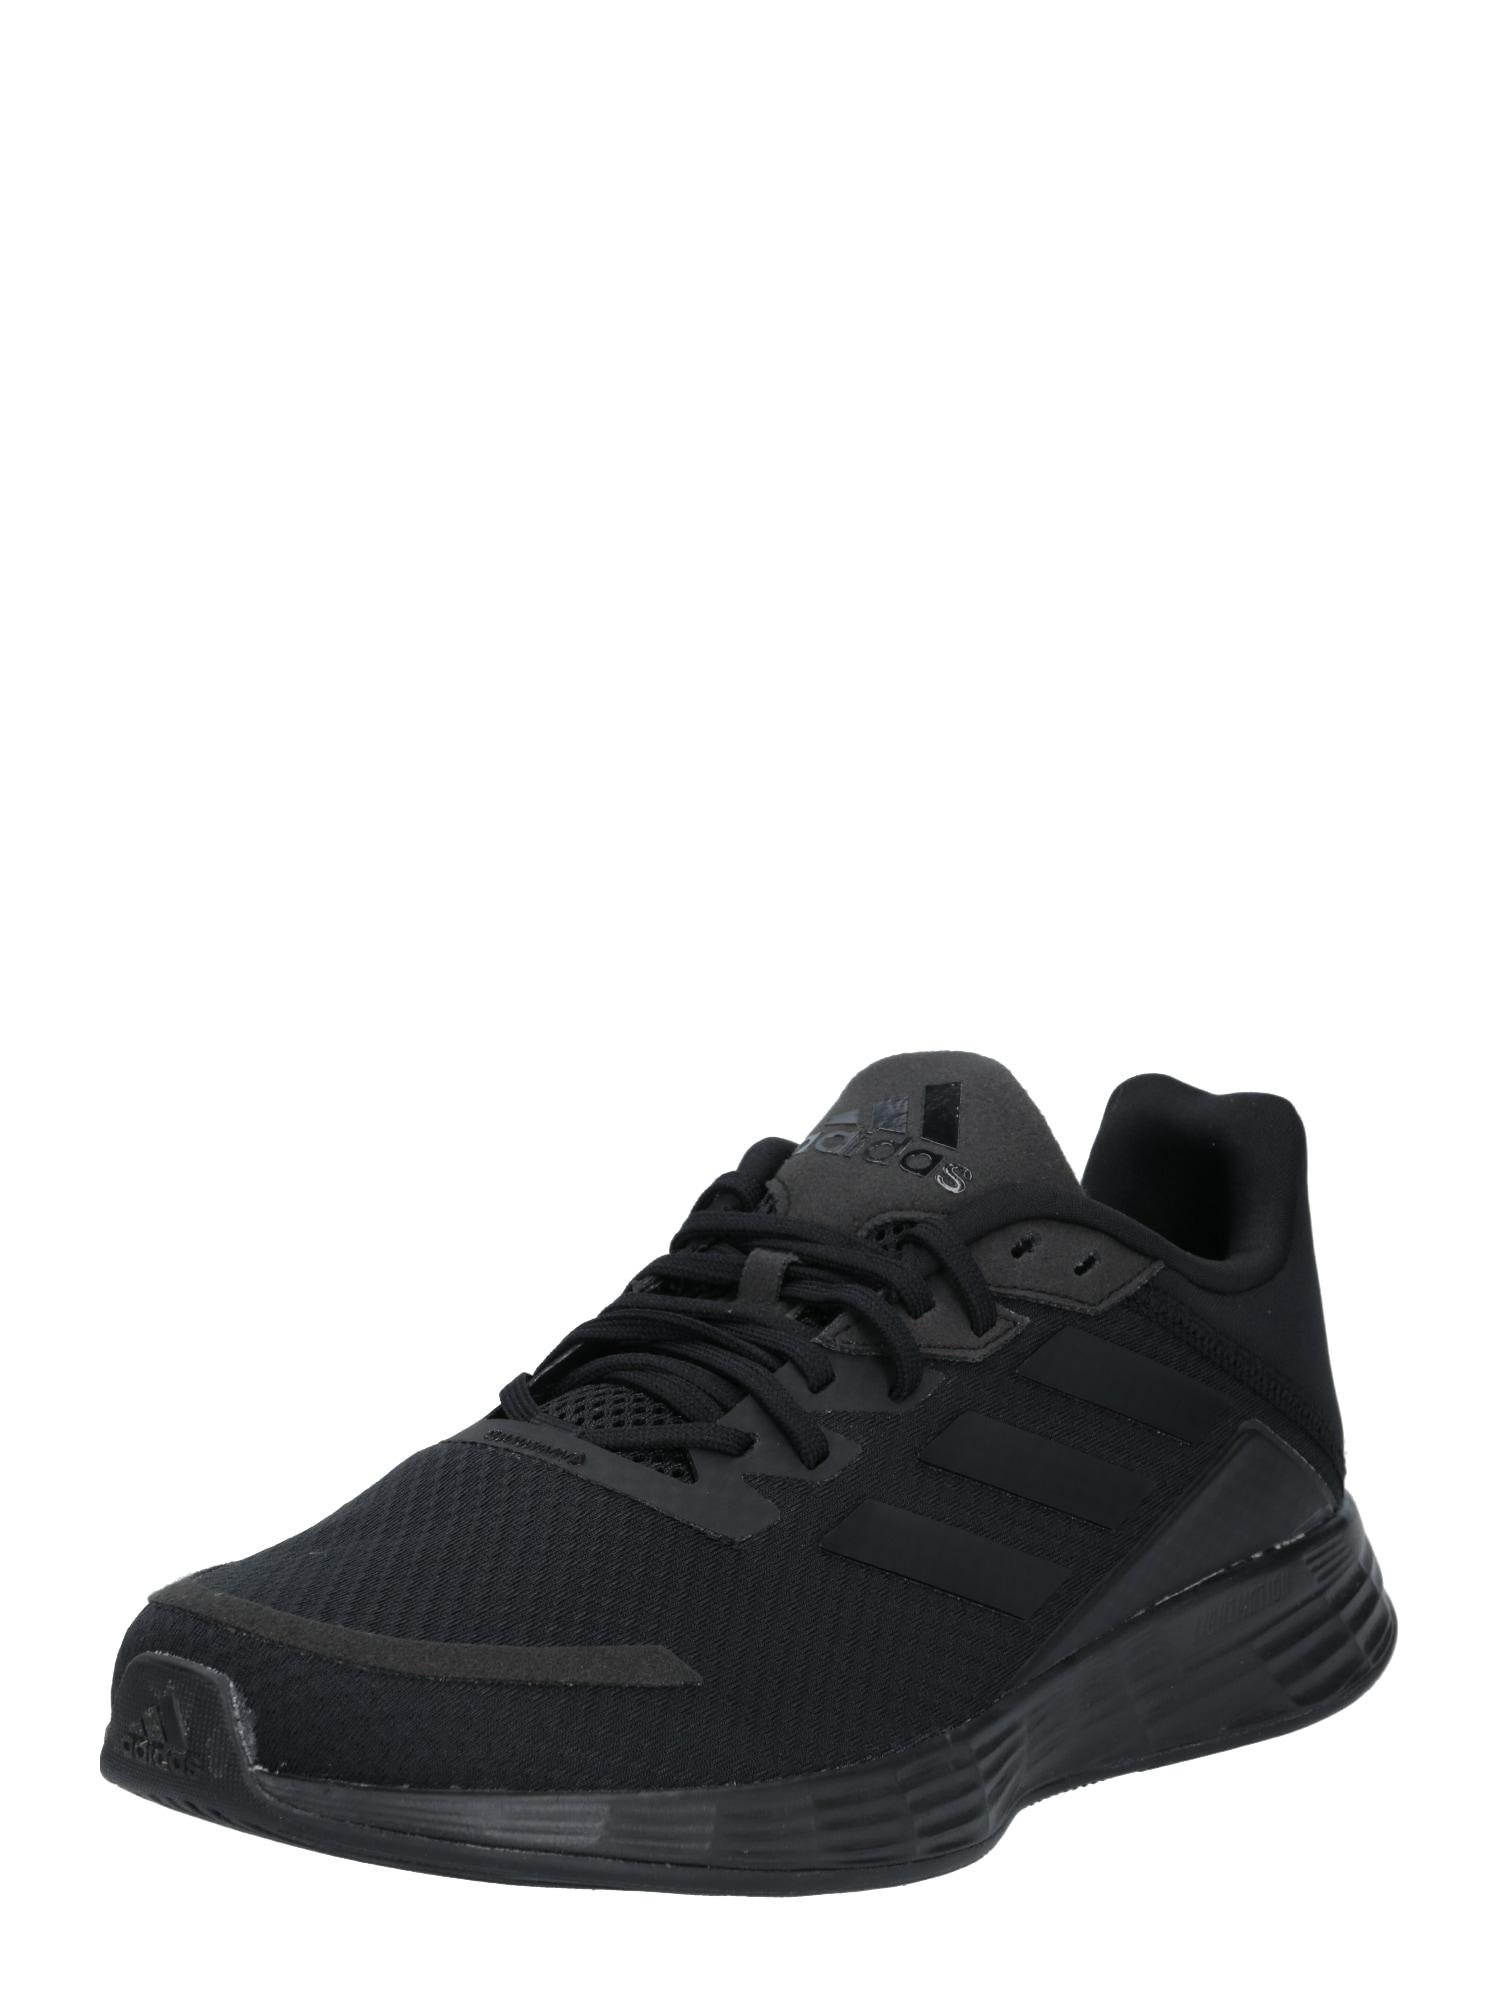 ADIDAS PERFORMANCE Běžecká obuv 'DURAMO'  černá